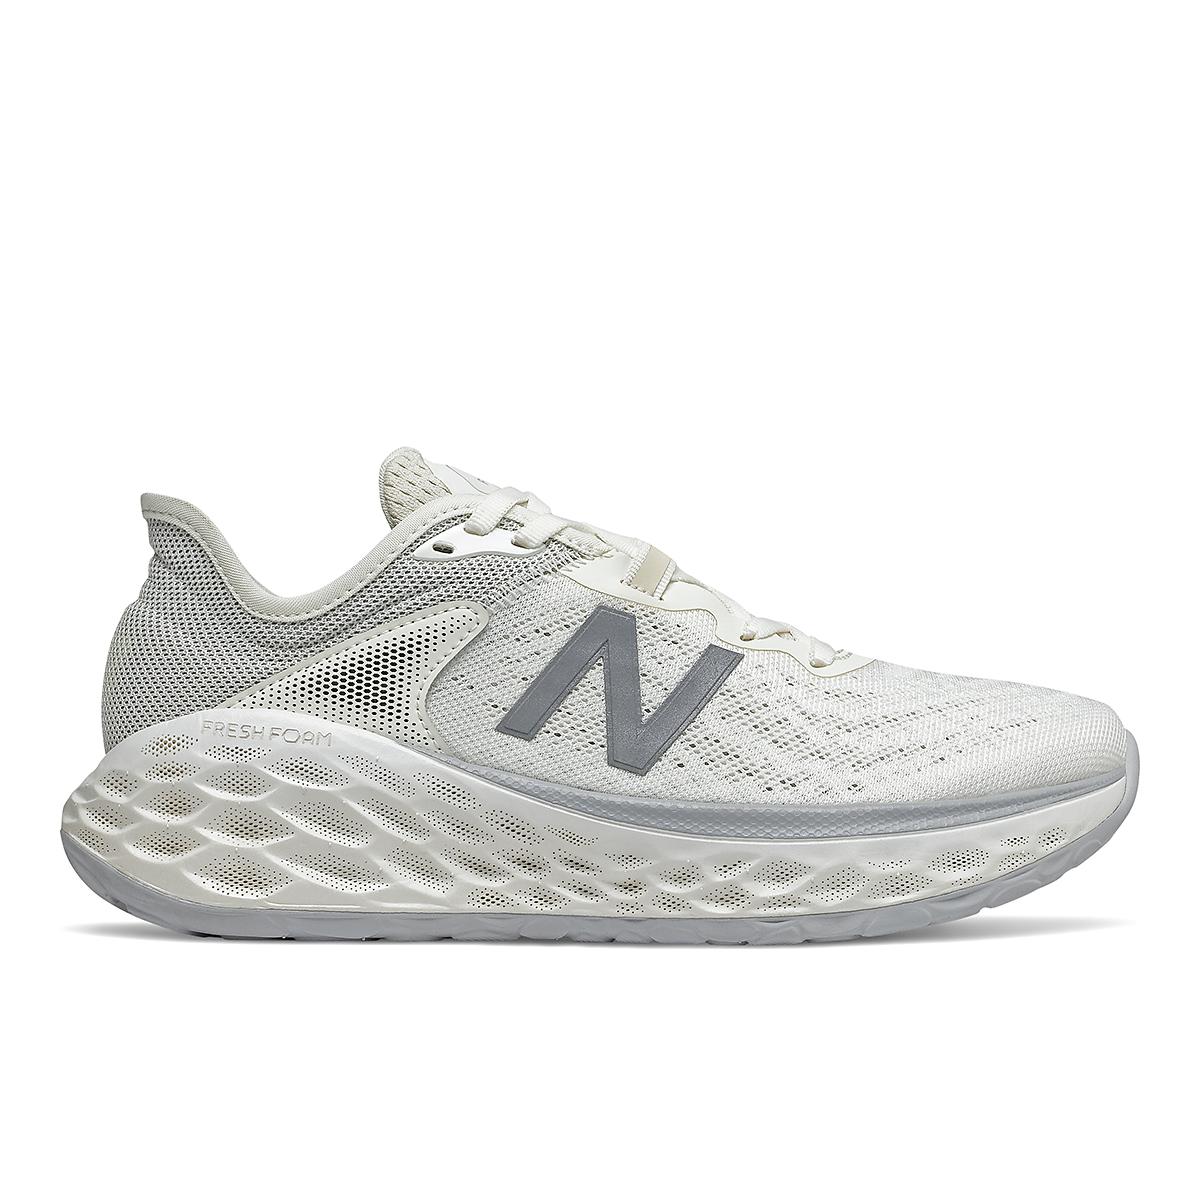 Women's New Balance Fresh Foam More V2 Running Shoe - Color: Sea Salt - Size: 5 - Width: Extra Wide, Sea Salt, large, image 1